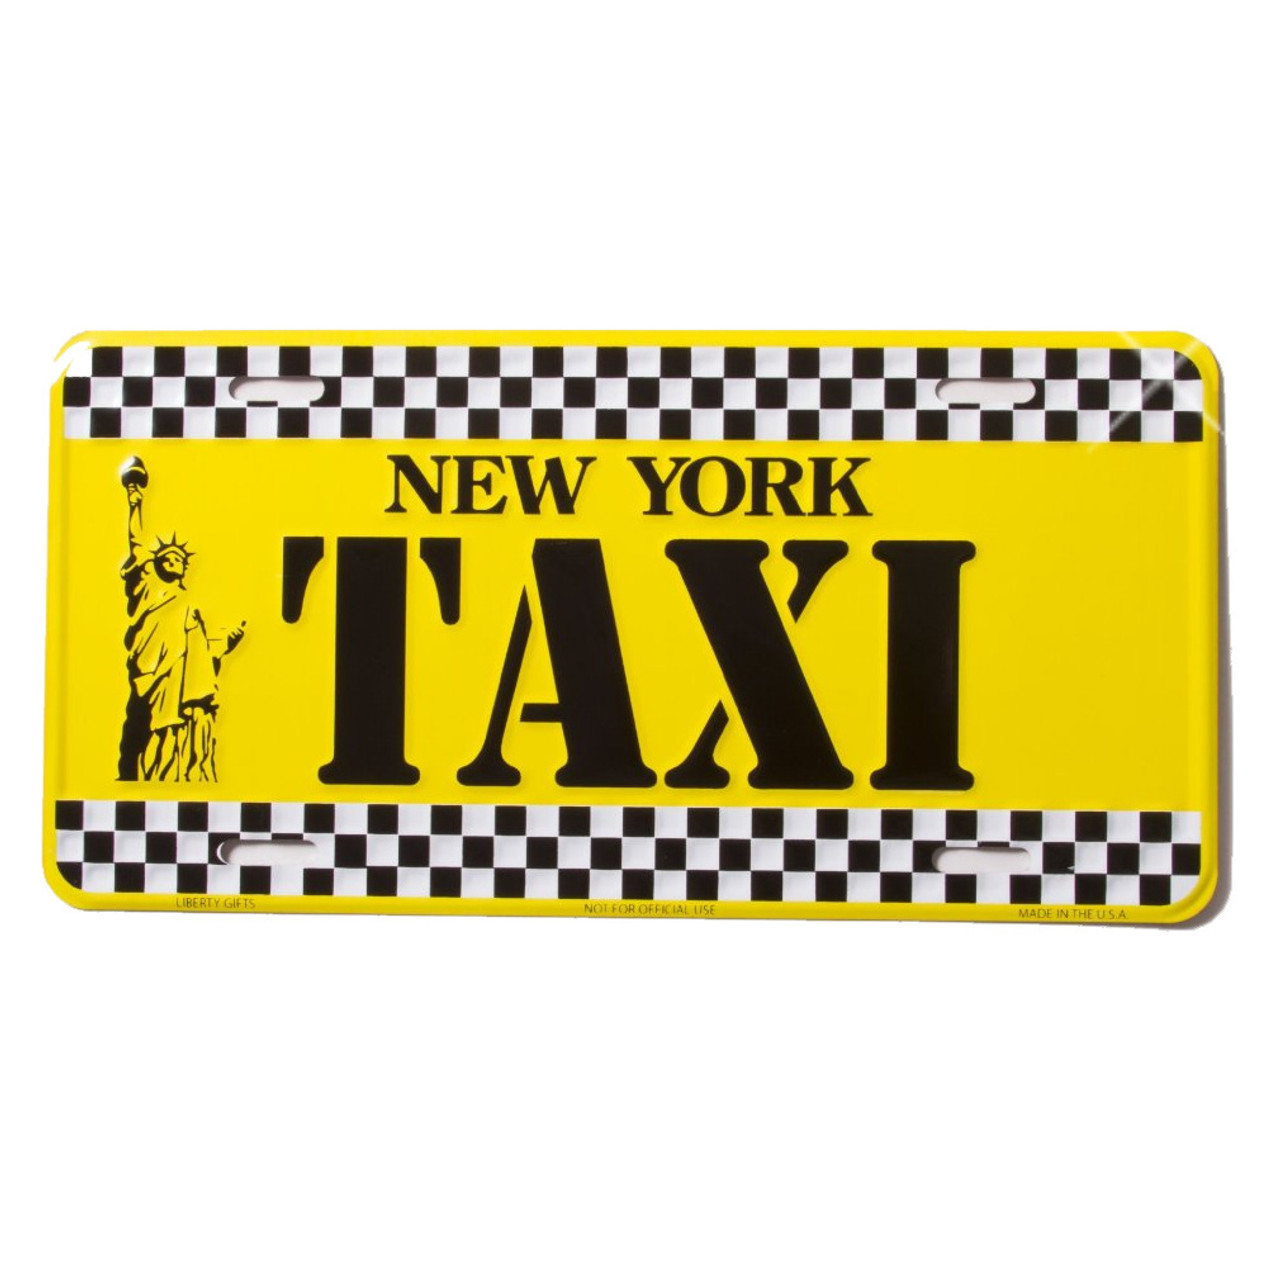 Car Games New York Taxi